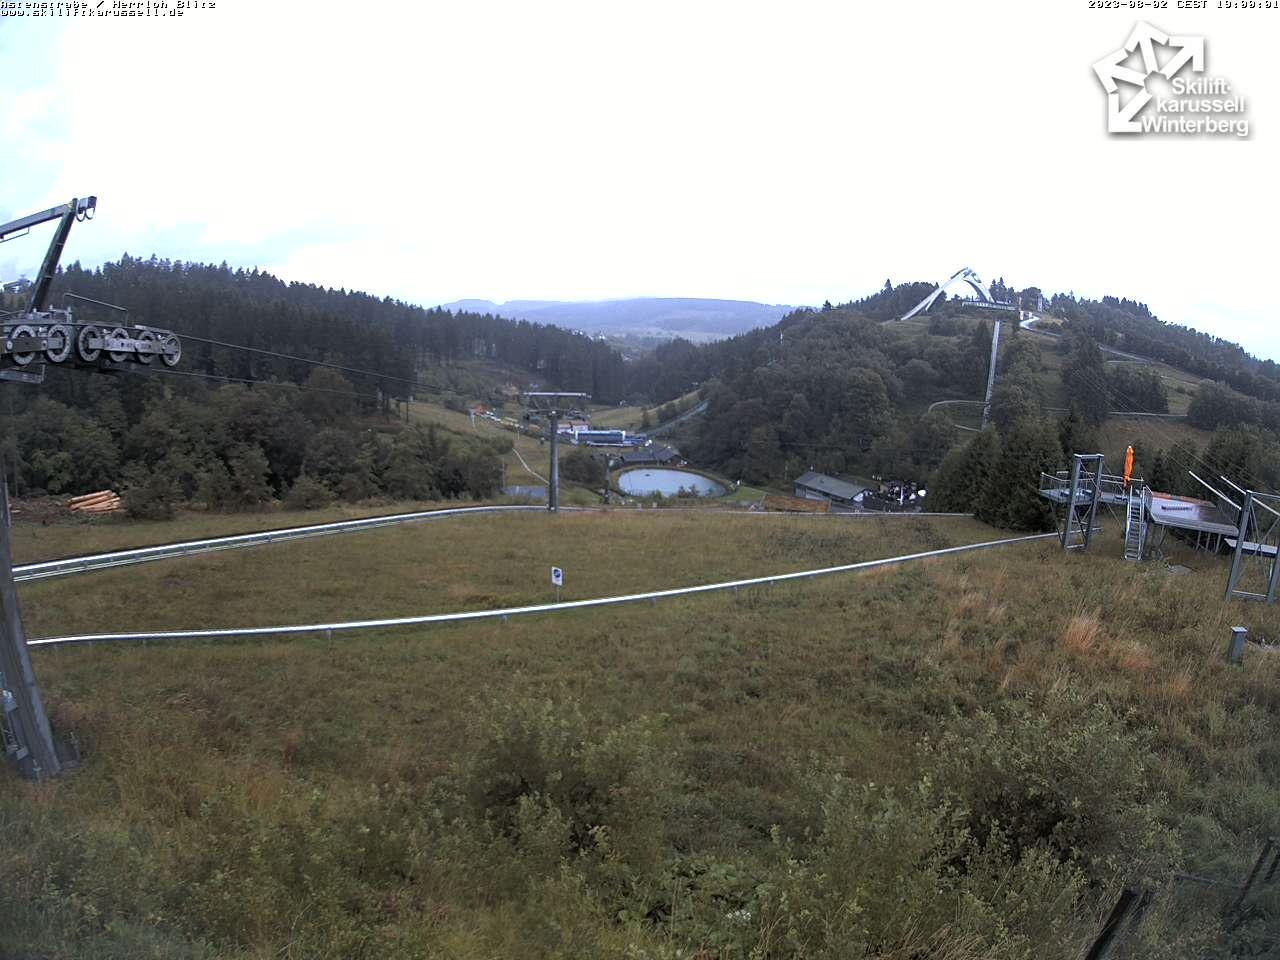 Webcam Astenstraße - Skiliftkarussell Winterberg